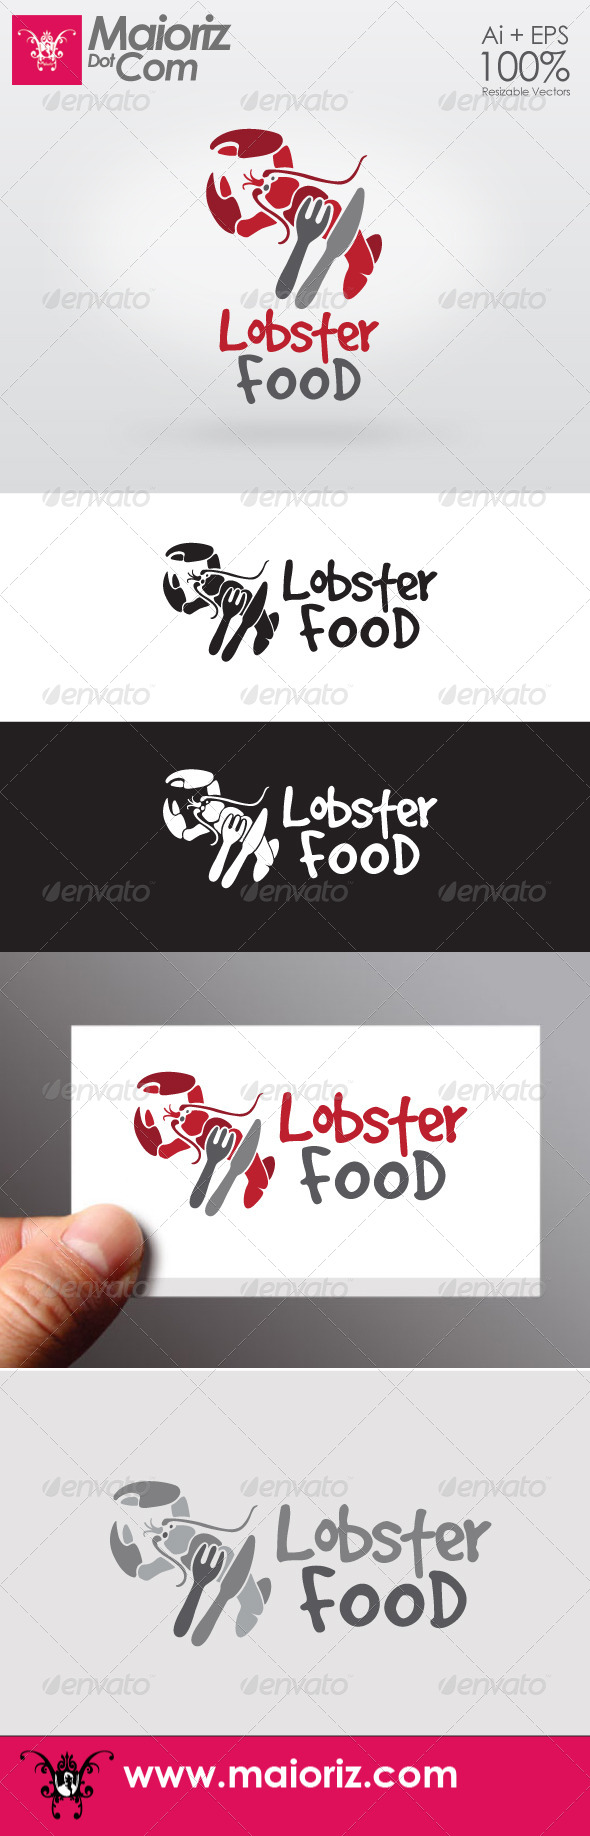 GraphicRiver Lobster Food Logo 6796973